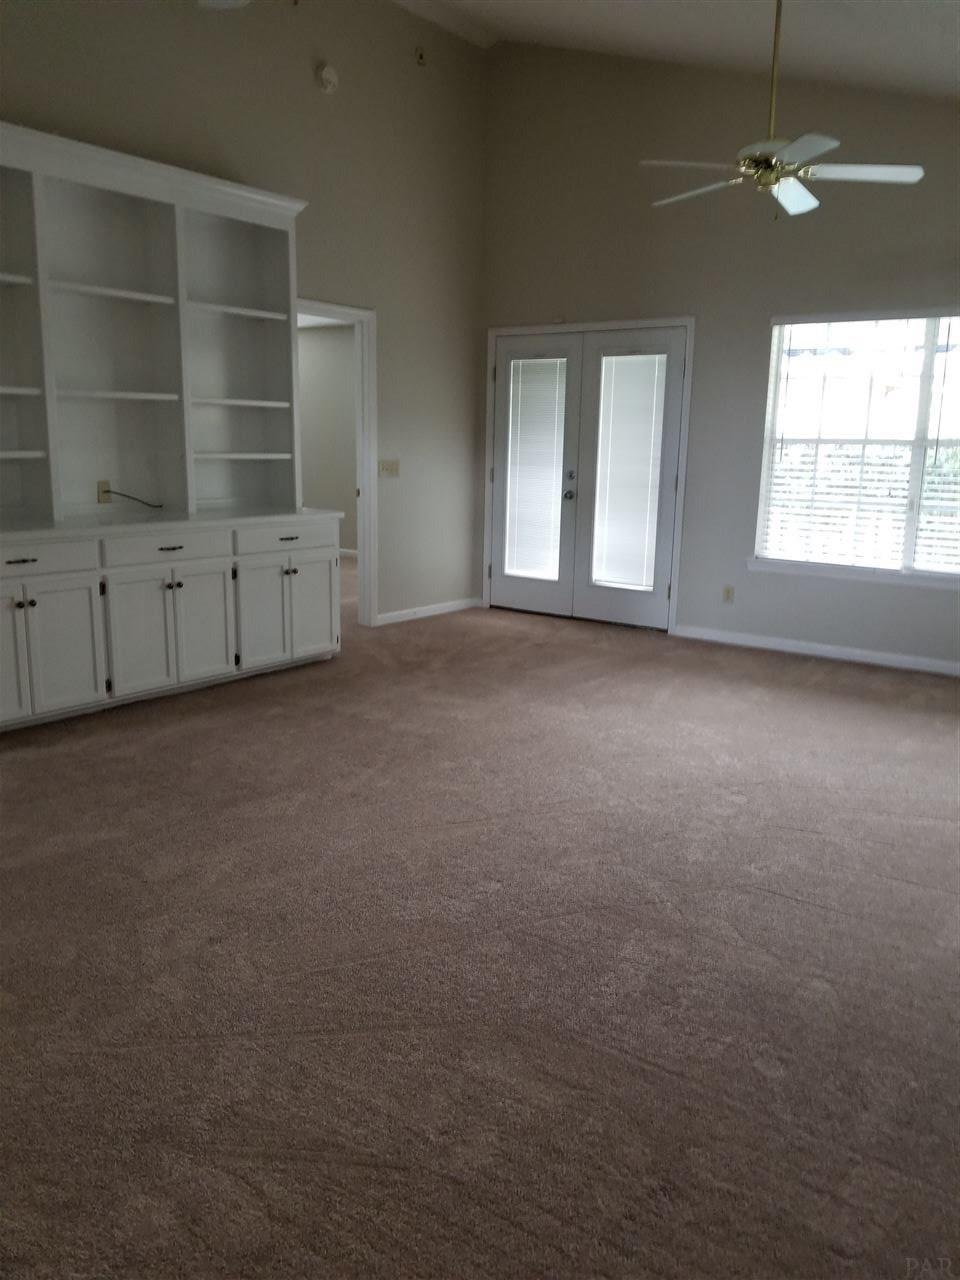 4327 Cedarview Ct, Pensacola, FL 32504